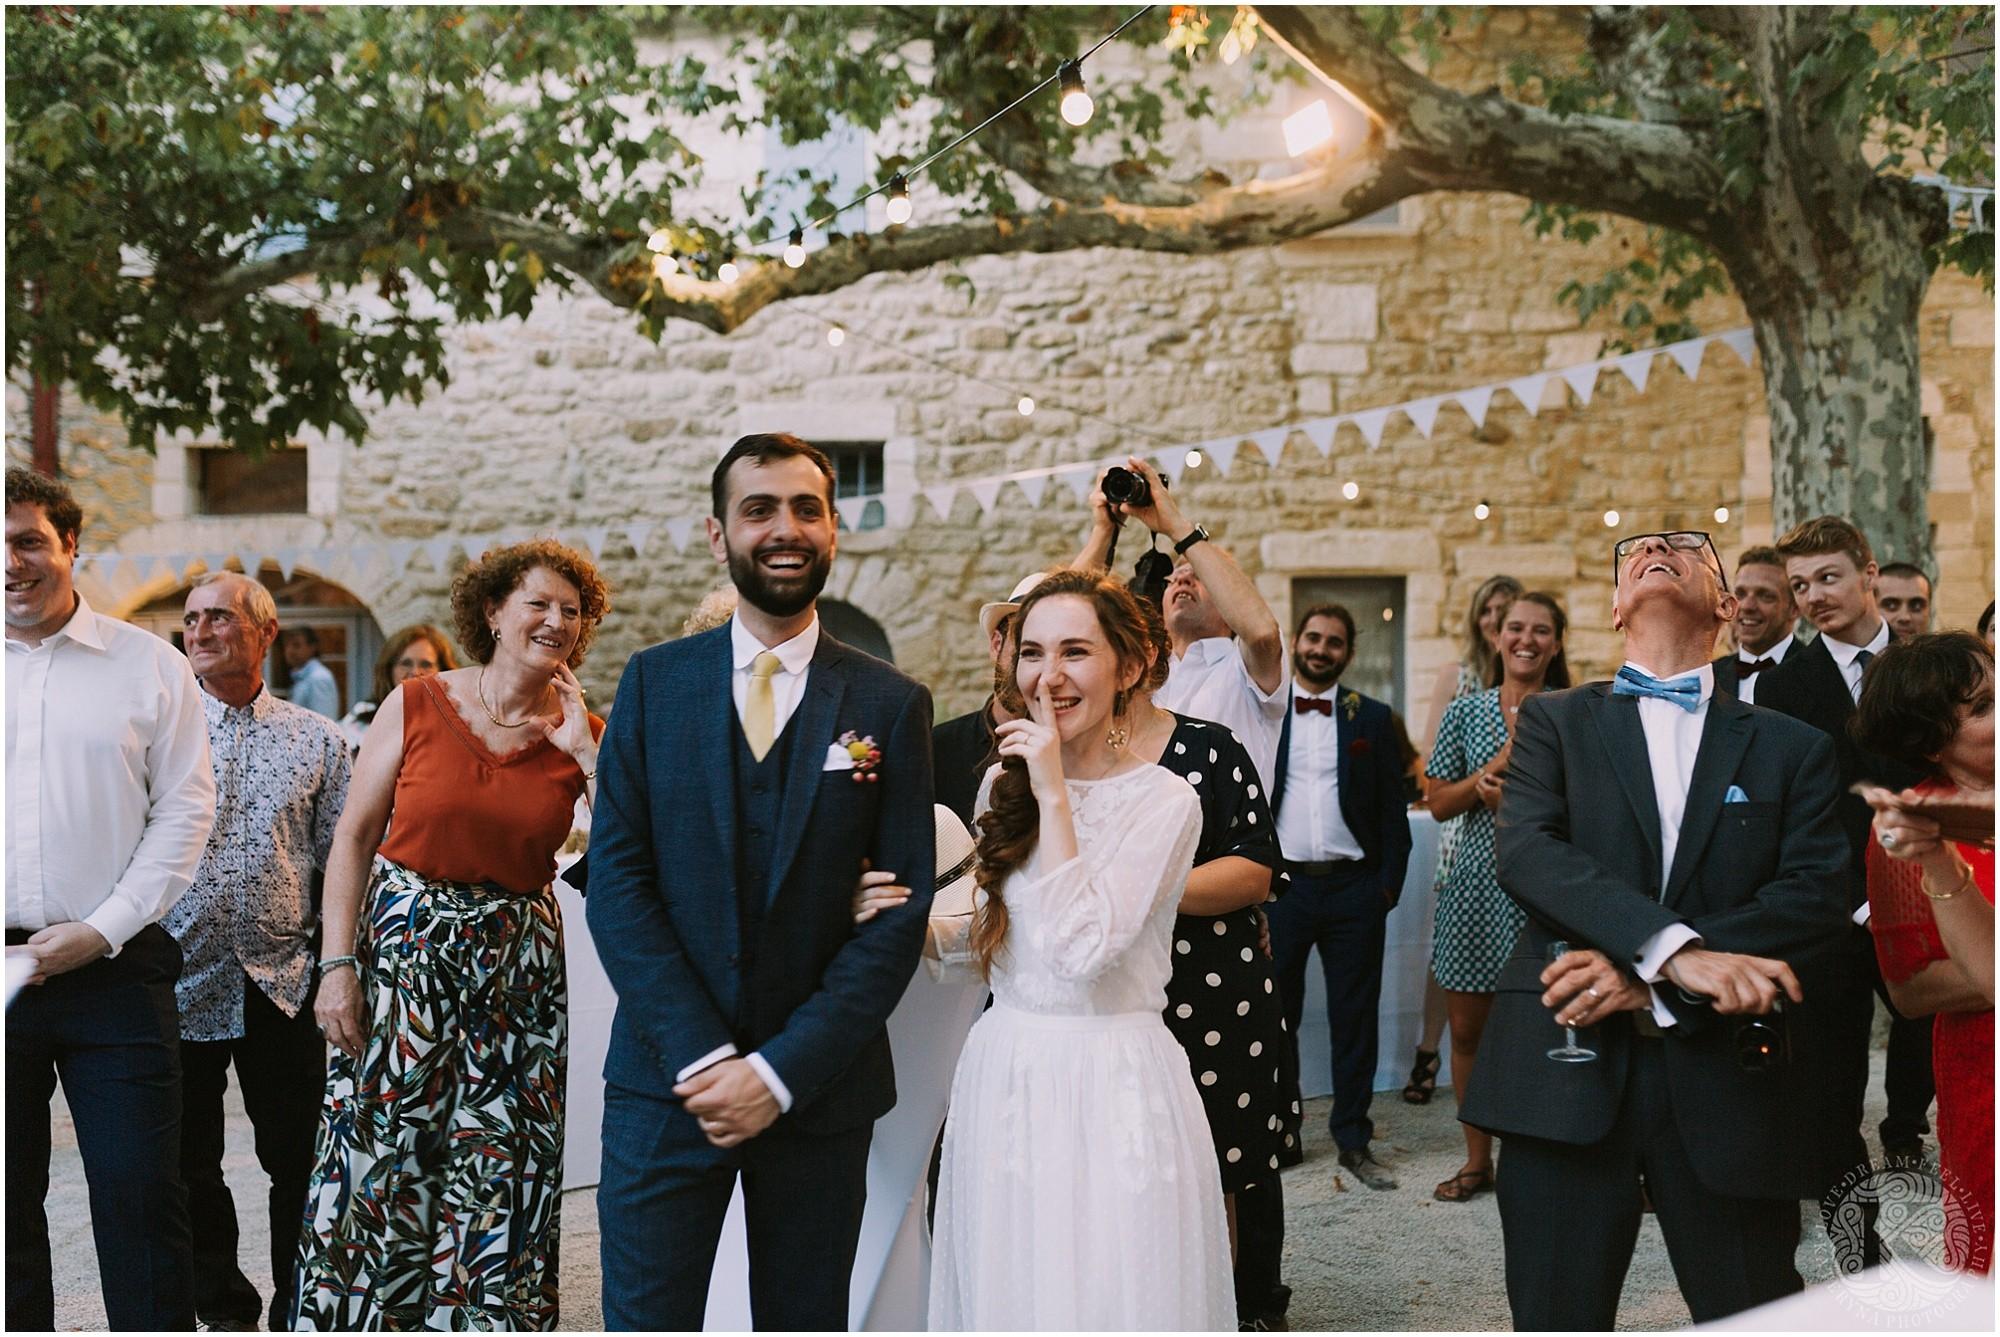 Kateryna-photos-photographe-mariage-vaucluse-provence-avignon-ferme-st-hugues_0088.jpg